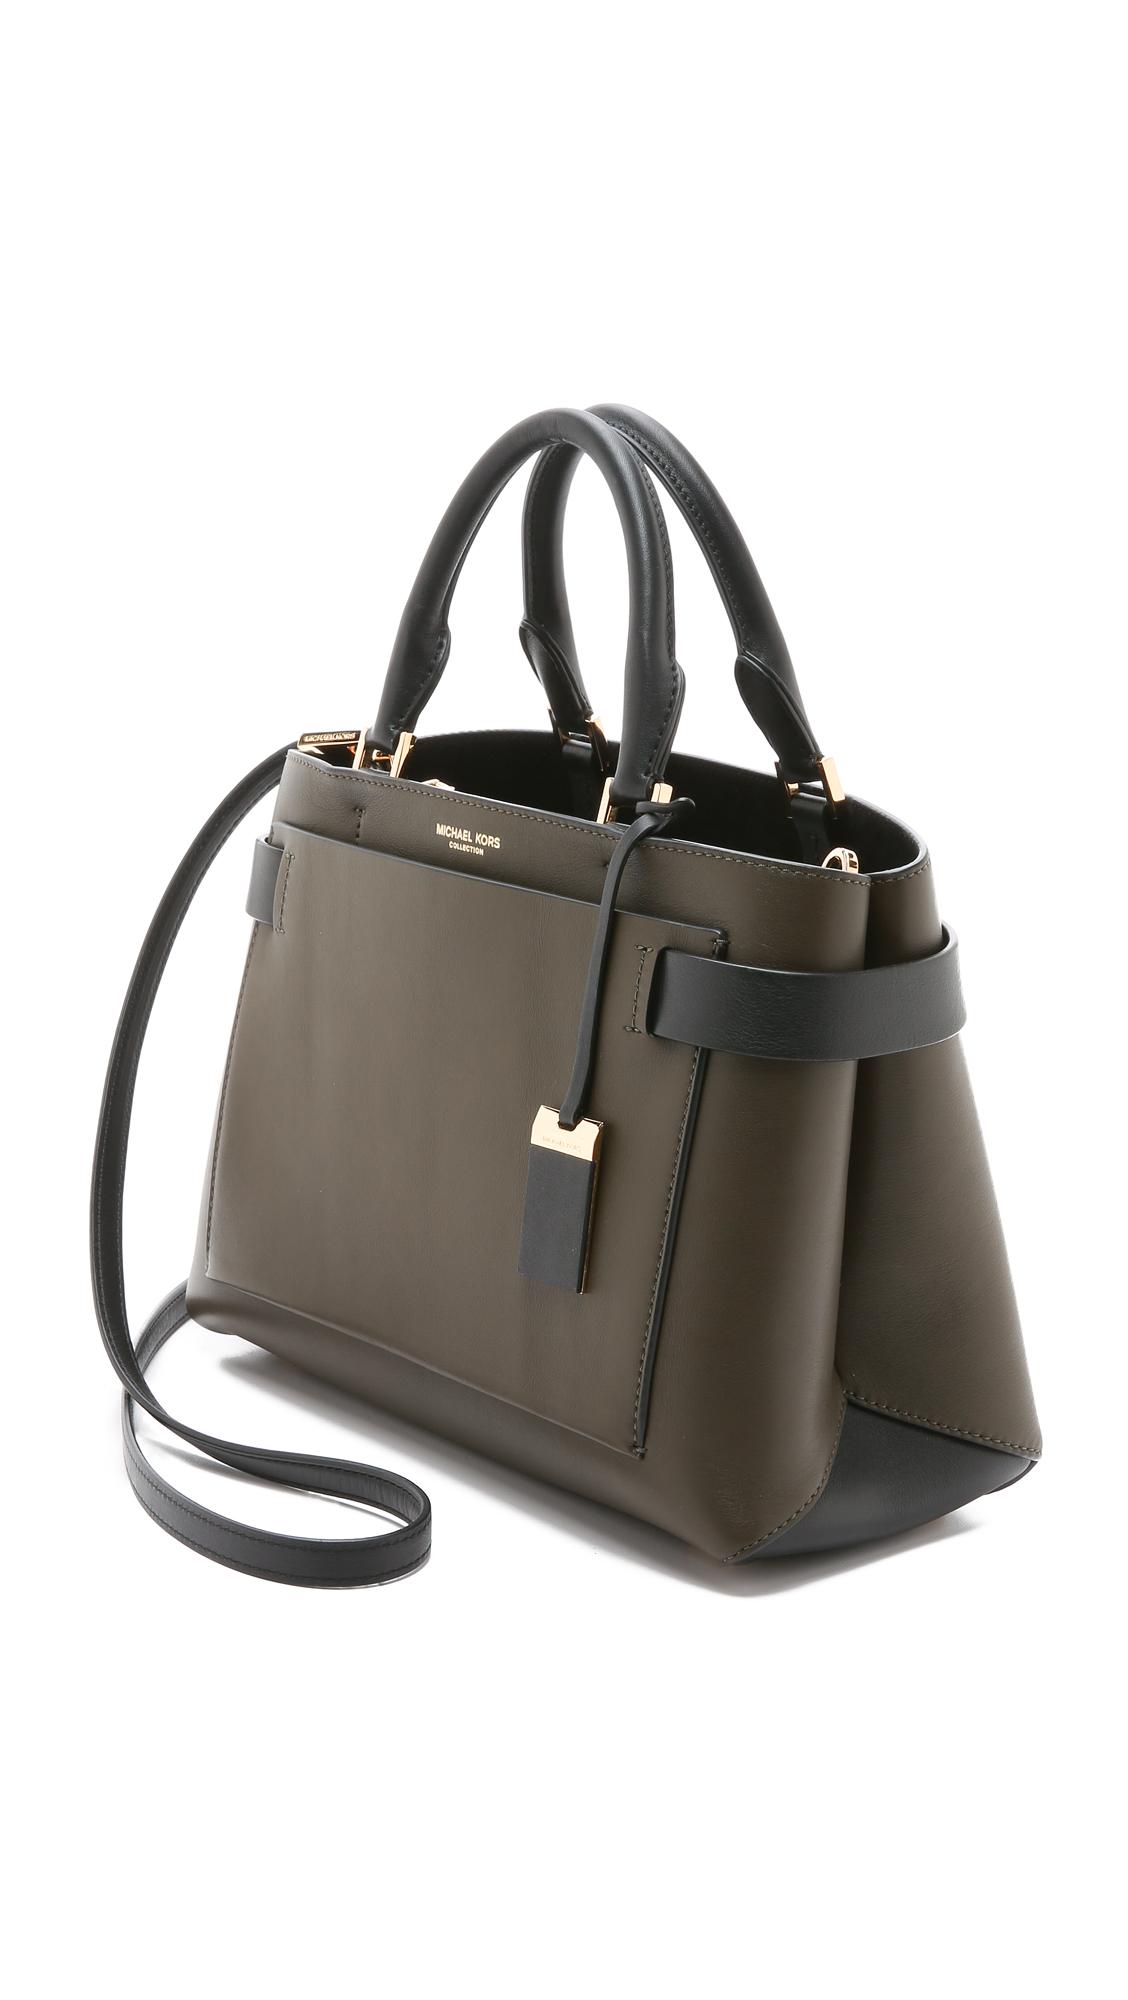 f5129c83570d michael kors audrey medium satchel black sneakers for women ...